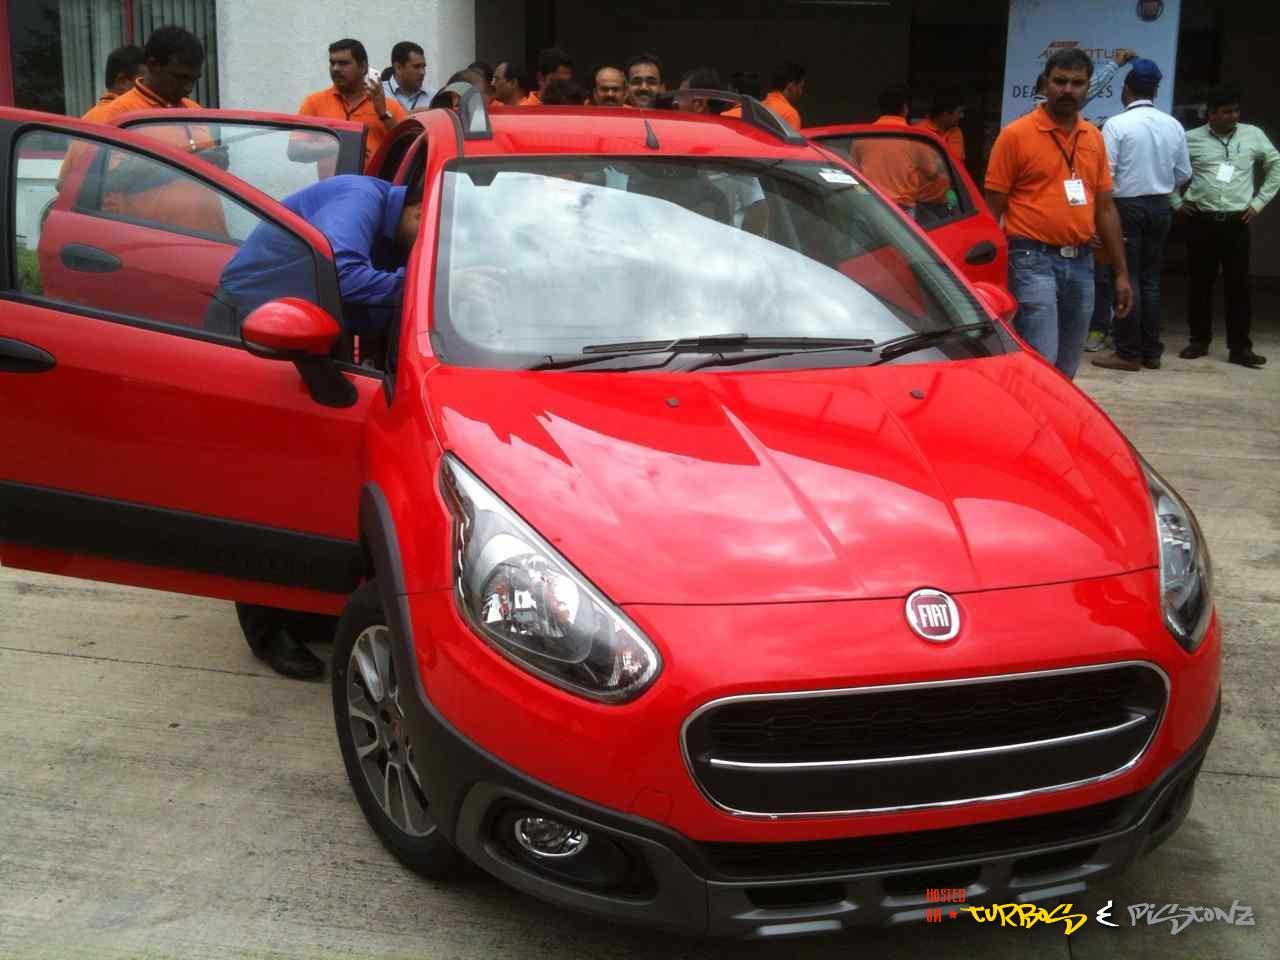 Fiat-Avventura-Pics-Exotica-Red-Pic